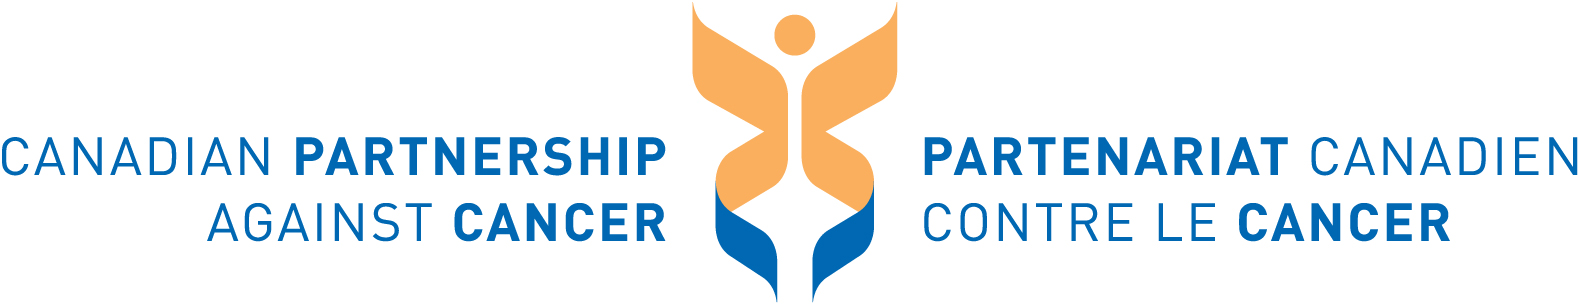 Canadian Partnership Against Cancer Logo